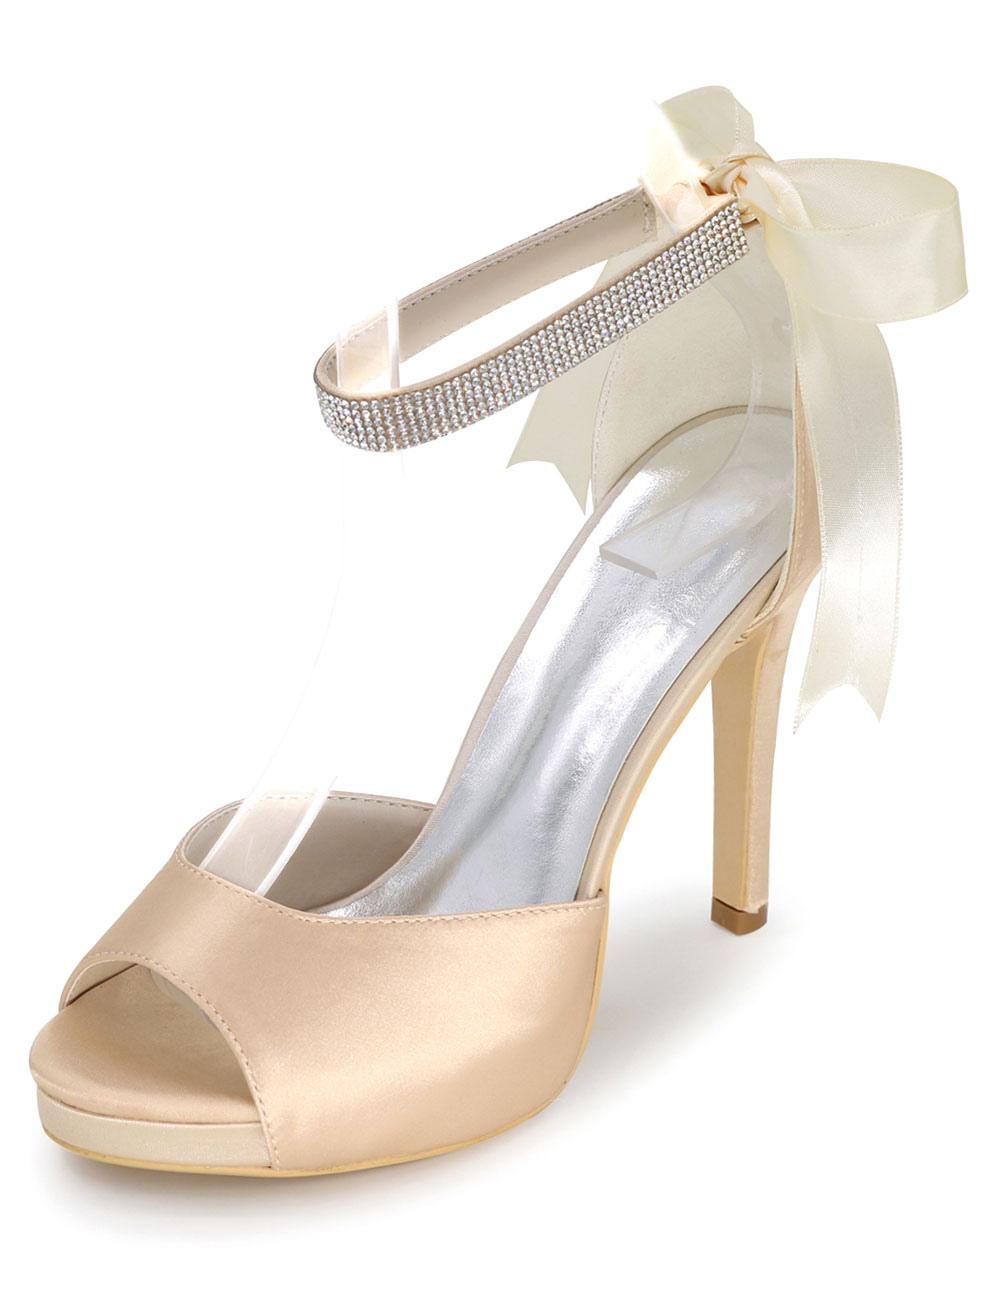 Platform Wedding Shoes Satin Sandals Women's High Heel Ankle Strap Stiletto Bridal Shoes